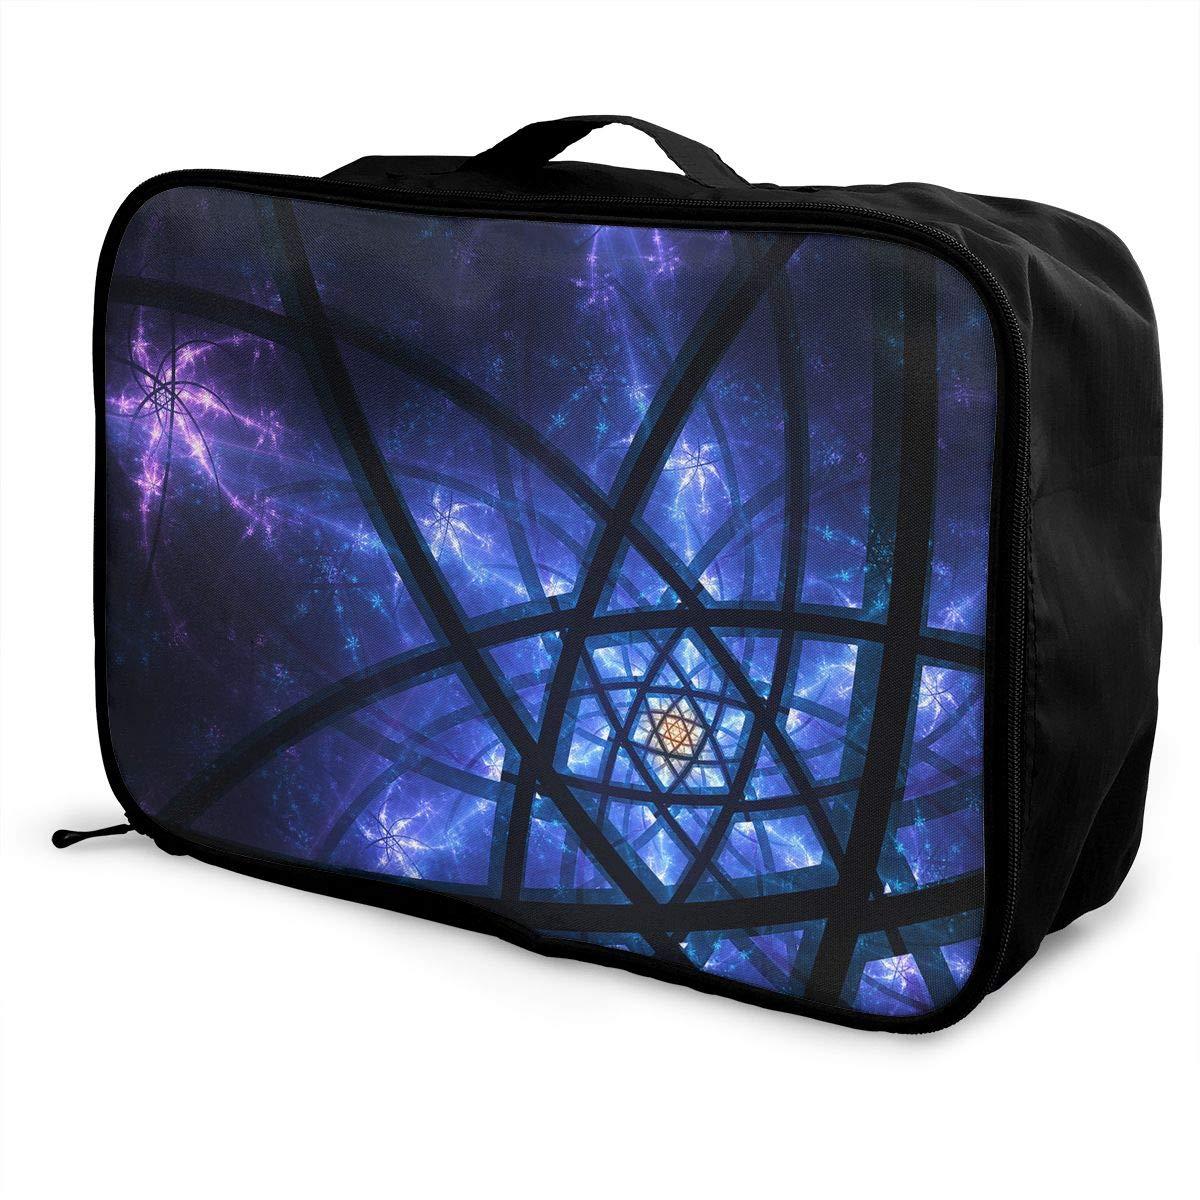 Travel Luggage Duffle Bag Lightweight Portable Handbag Fantasy Pattern Large Capacity Waterproof Foldable Storage Tote